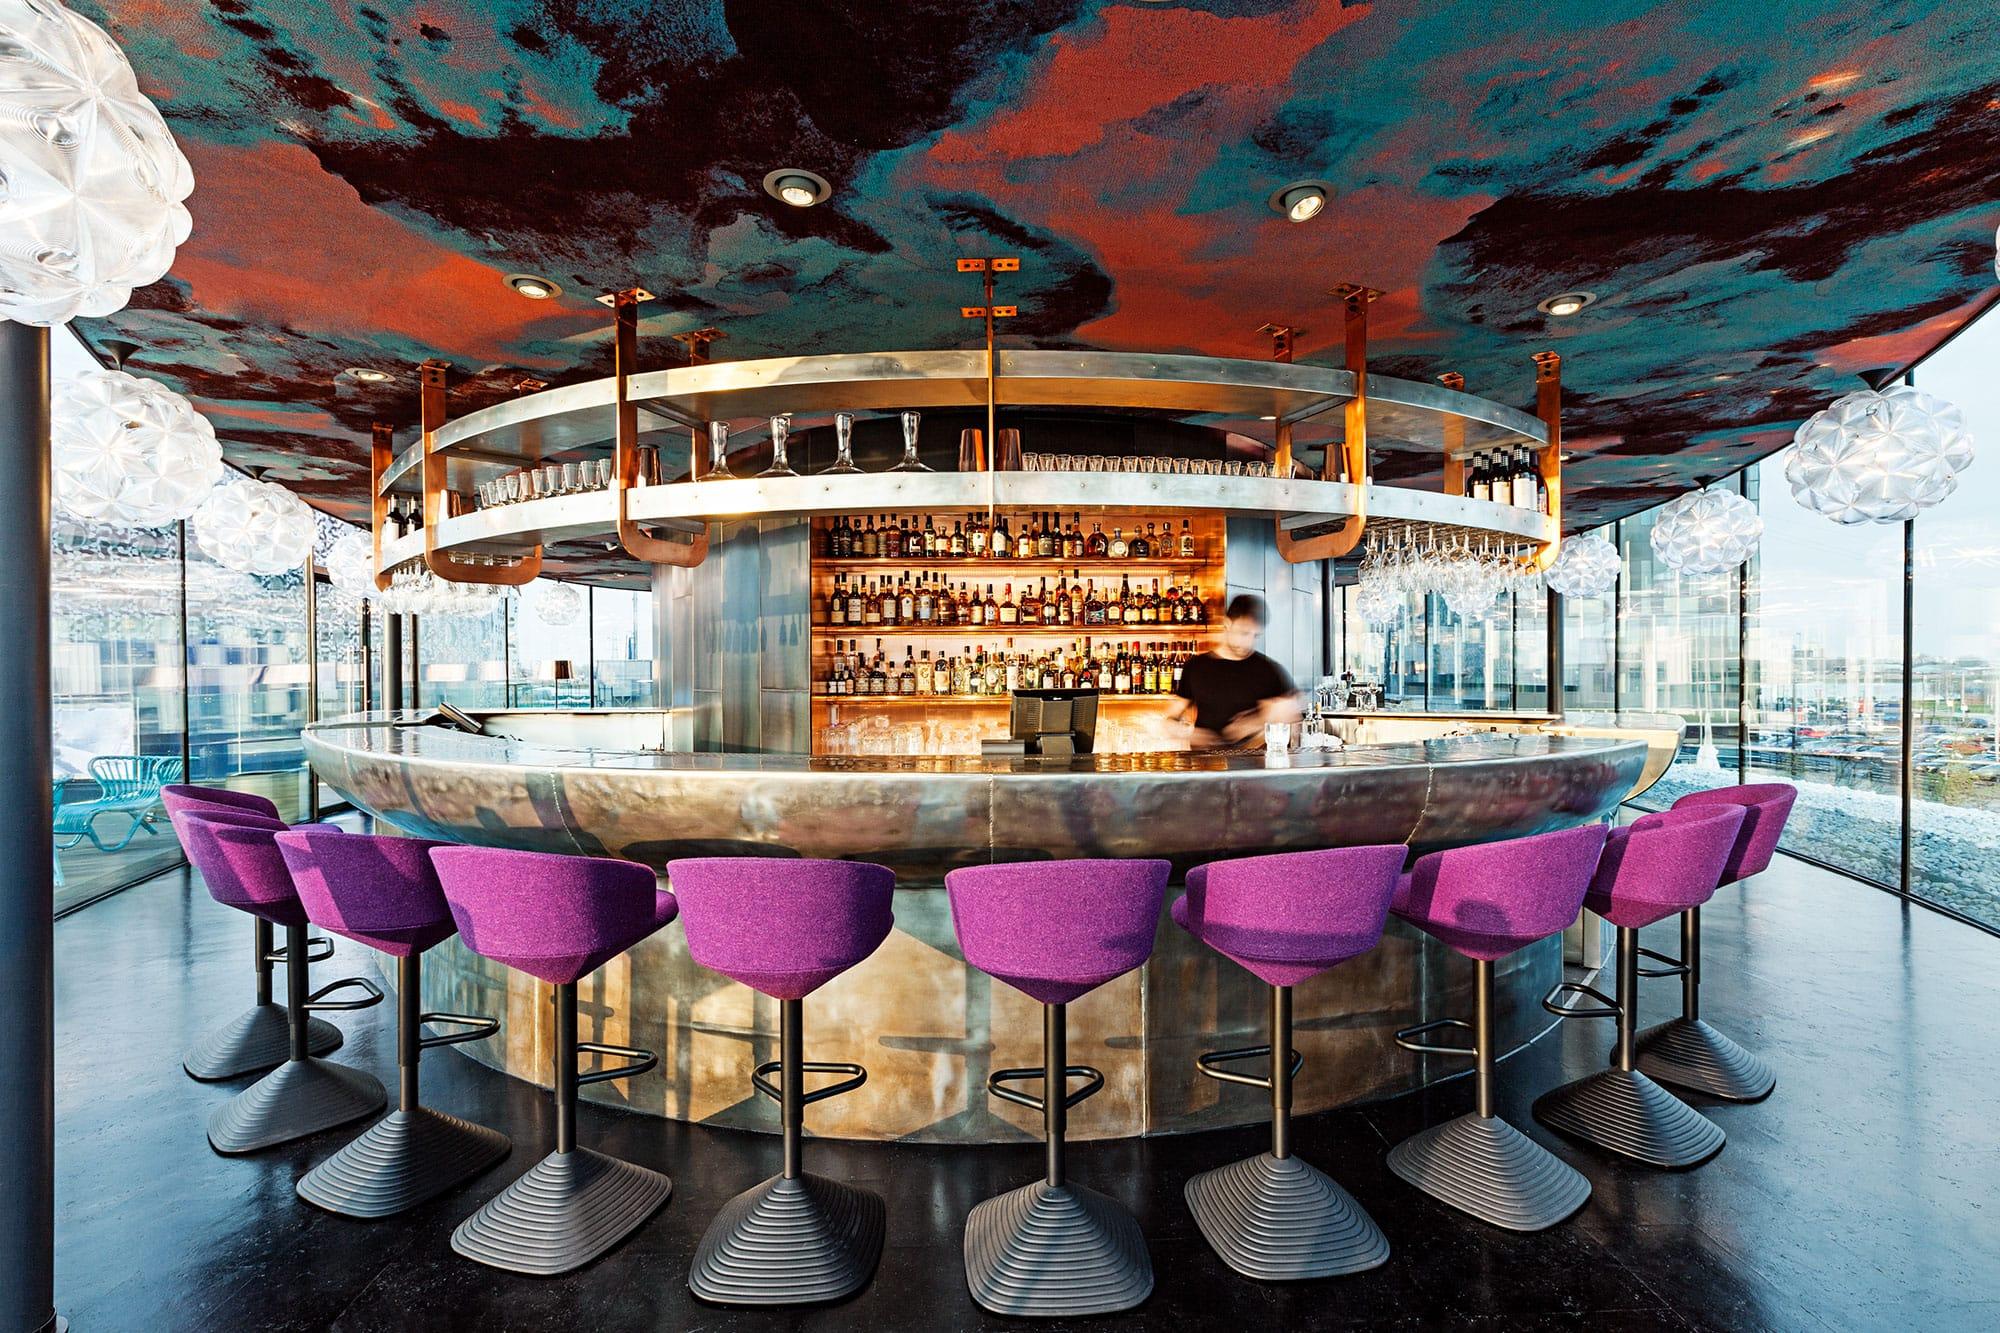 GB_DRS-Bar-London_Dixon-project_002_vn